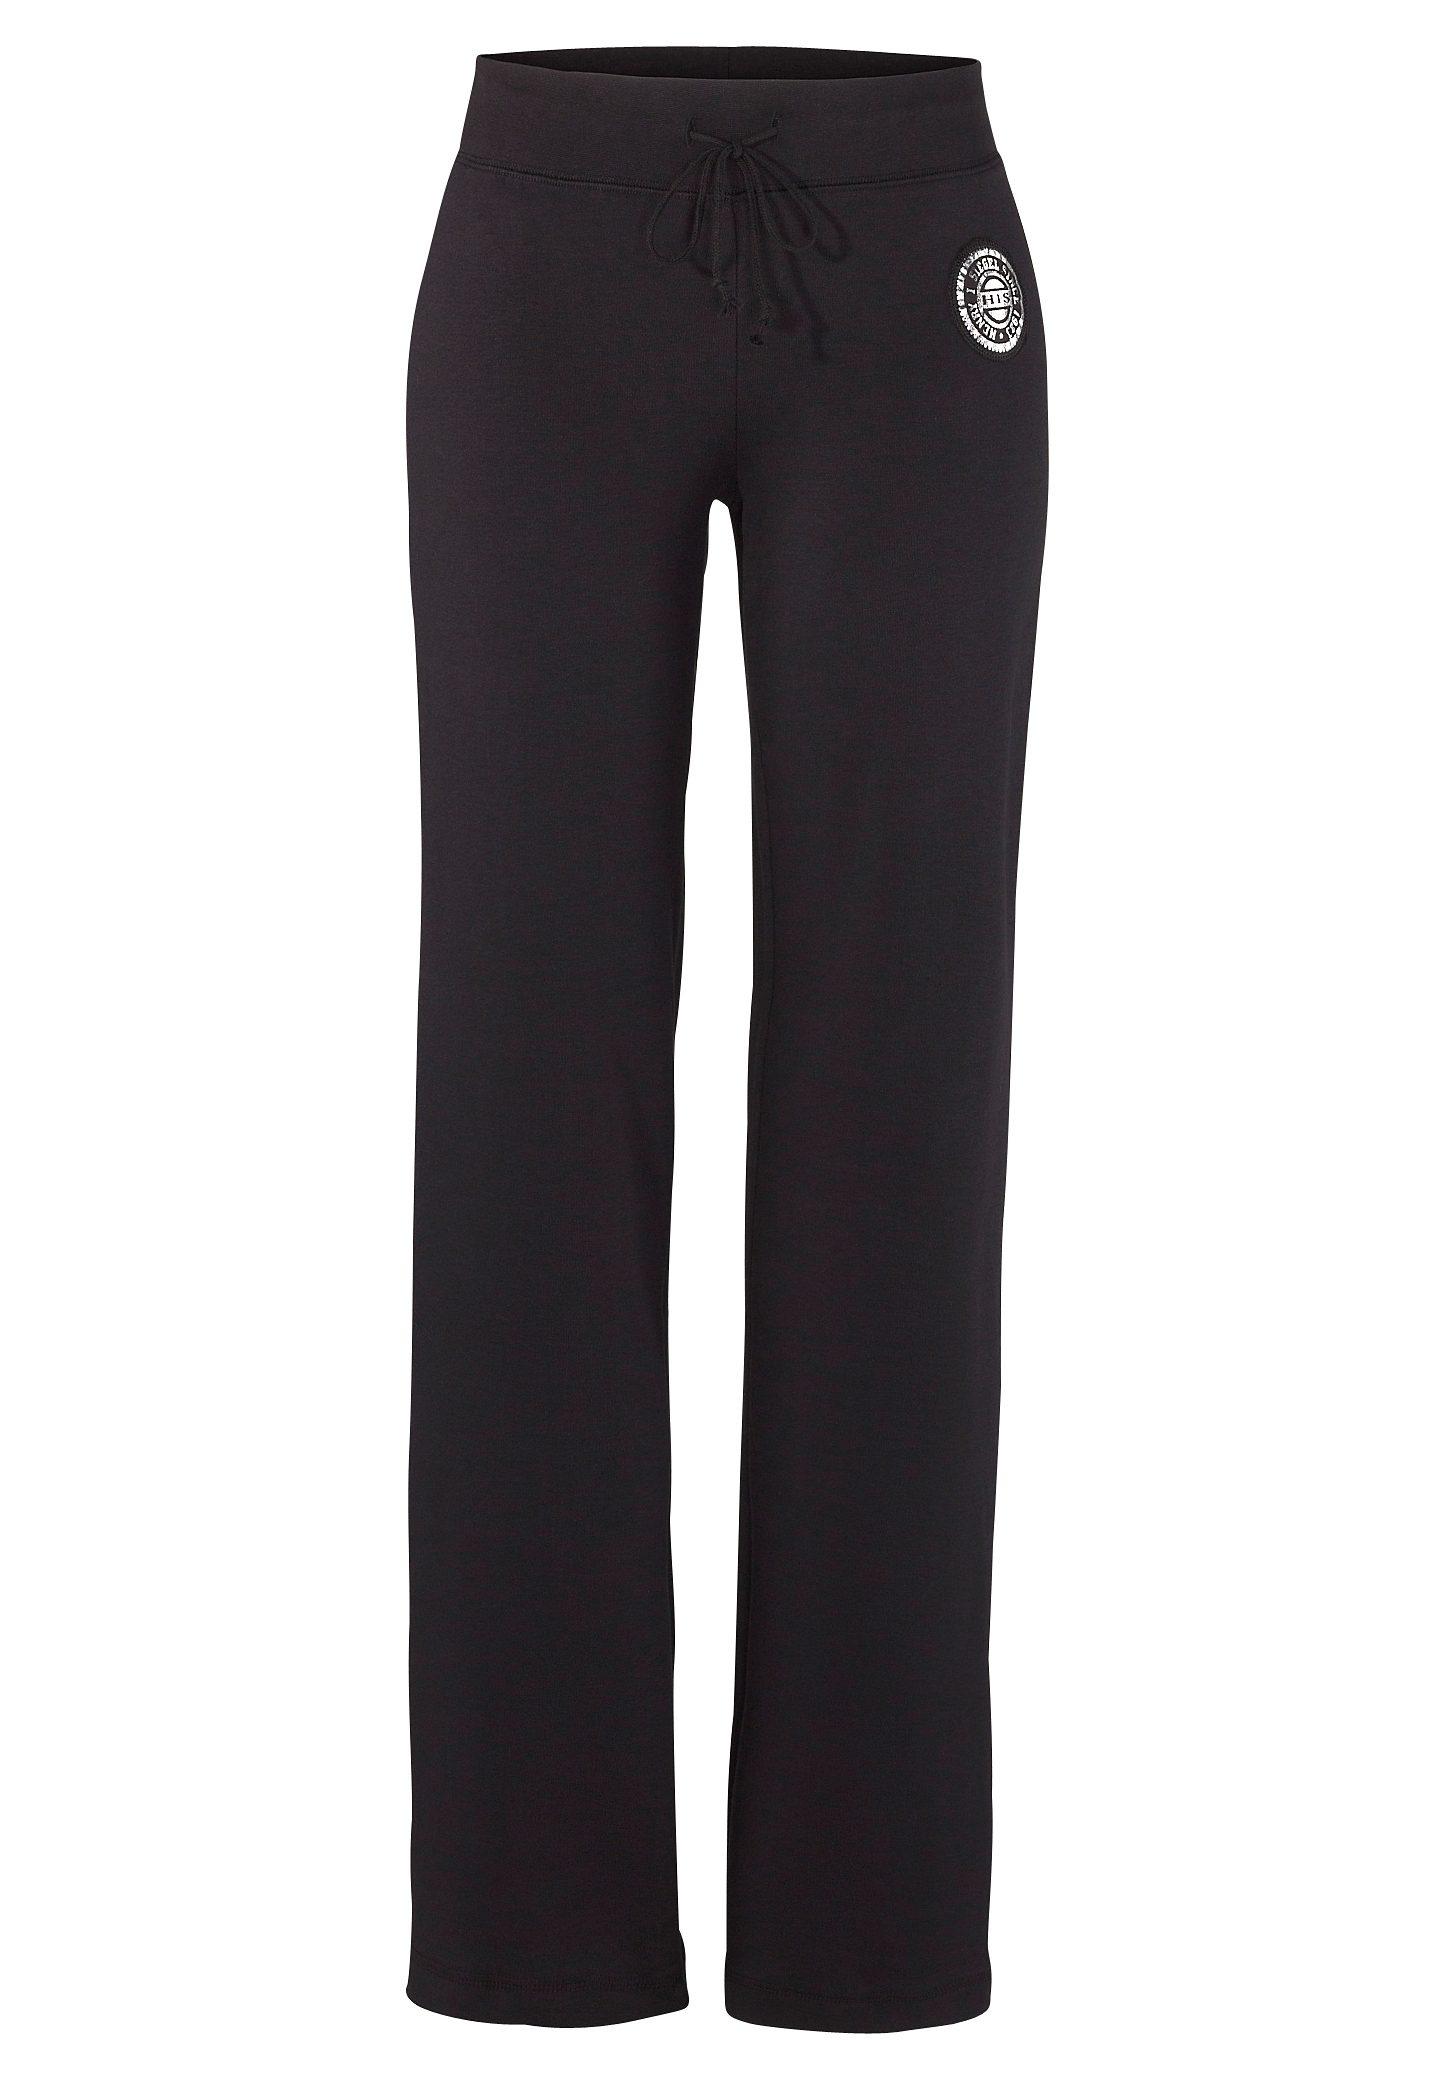 HIS Wellnesshose   Bekleidung > Homewear > Leggings   Schwarz   H.I.S